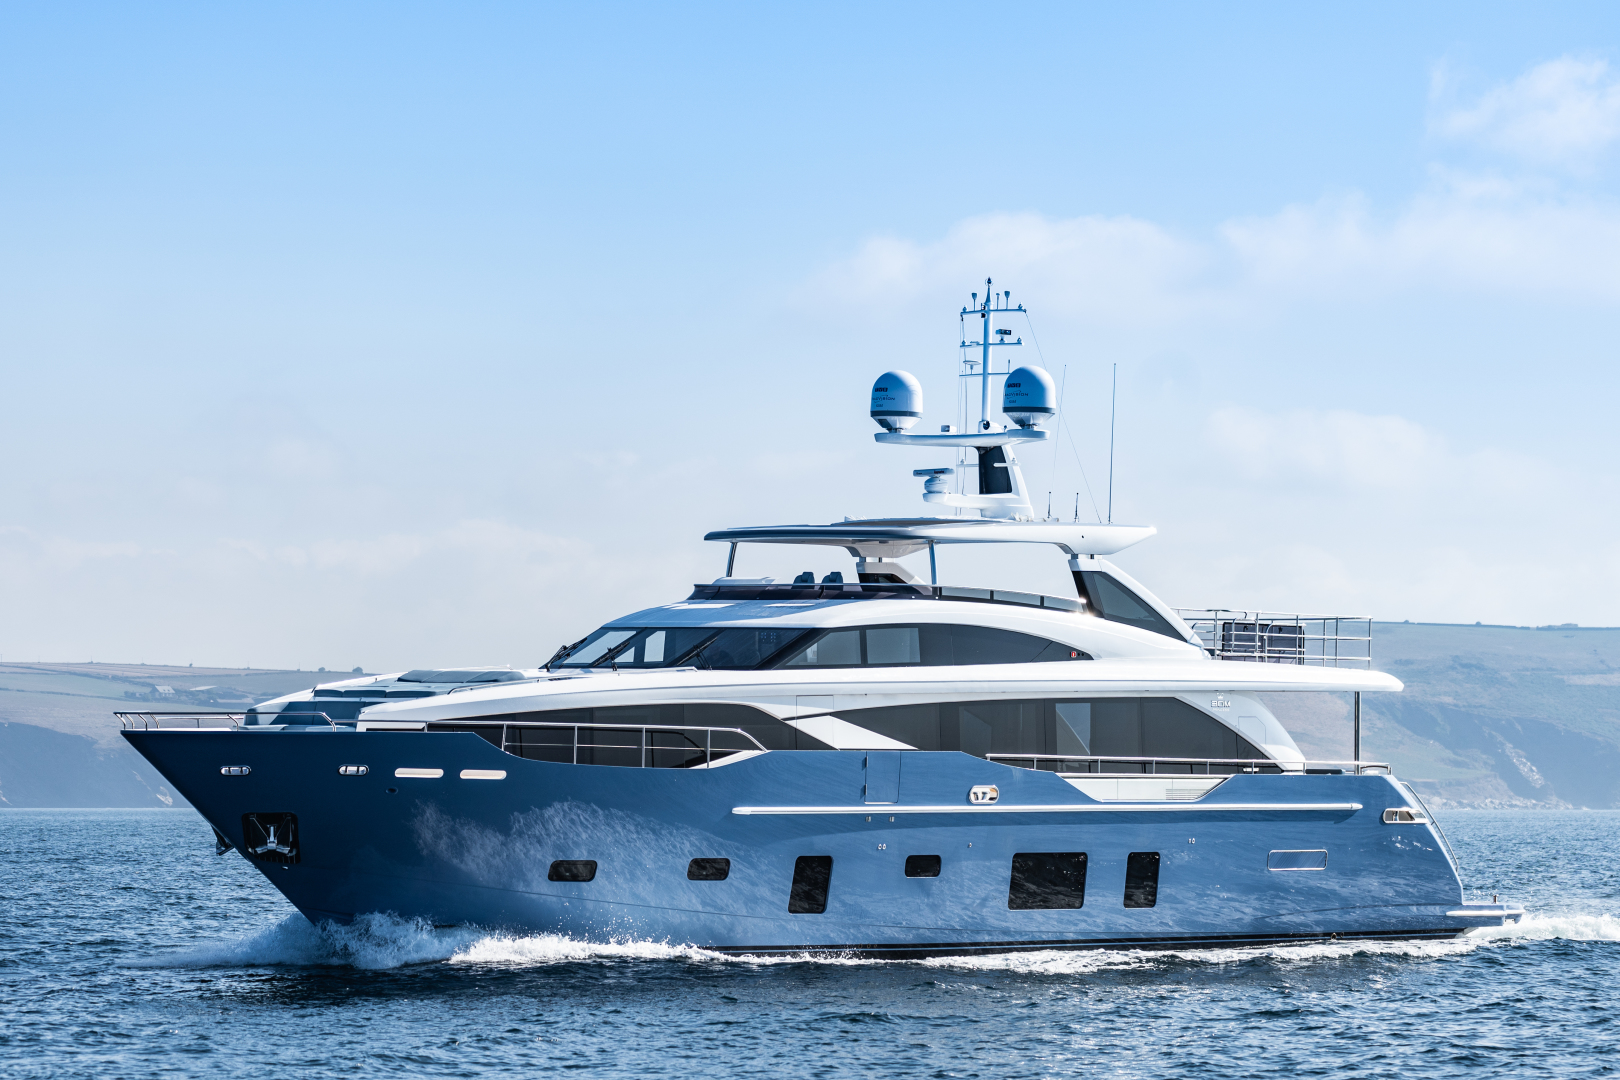 98' Princess 2019 30M Motor Yacht Hallelujah